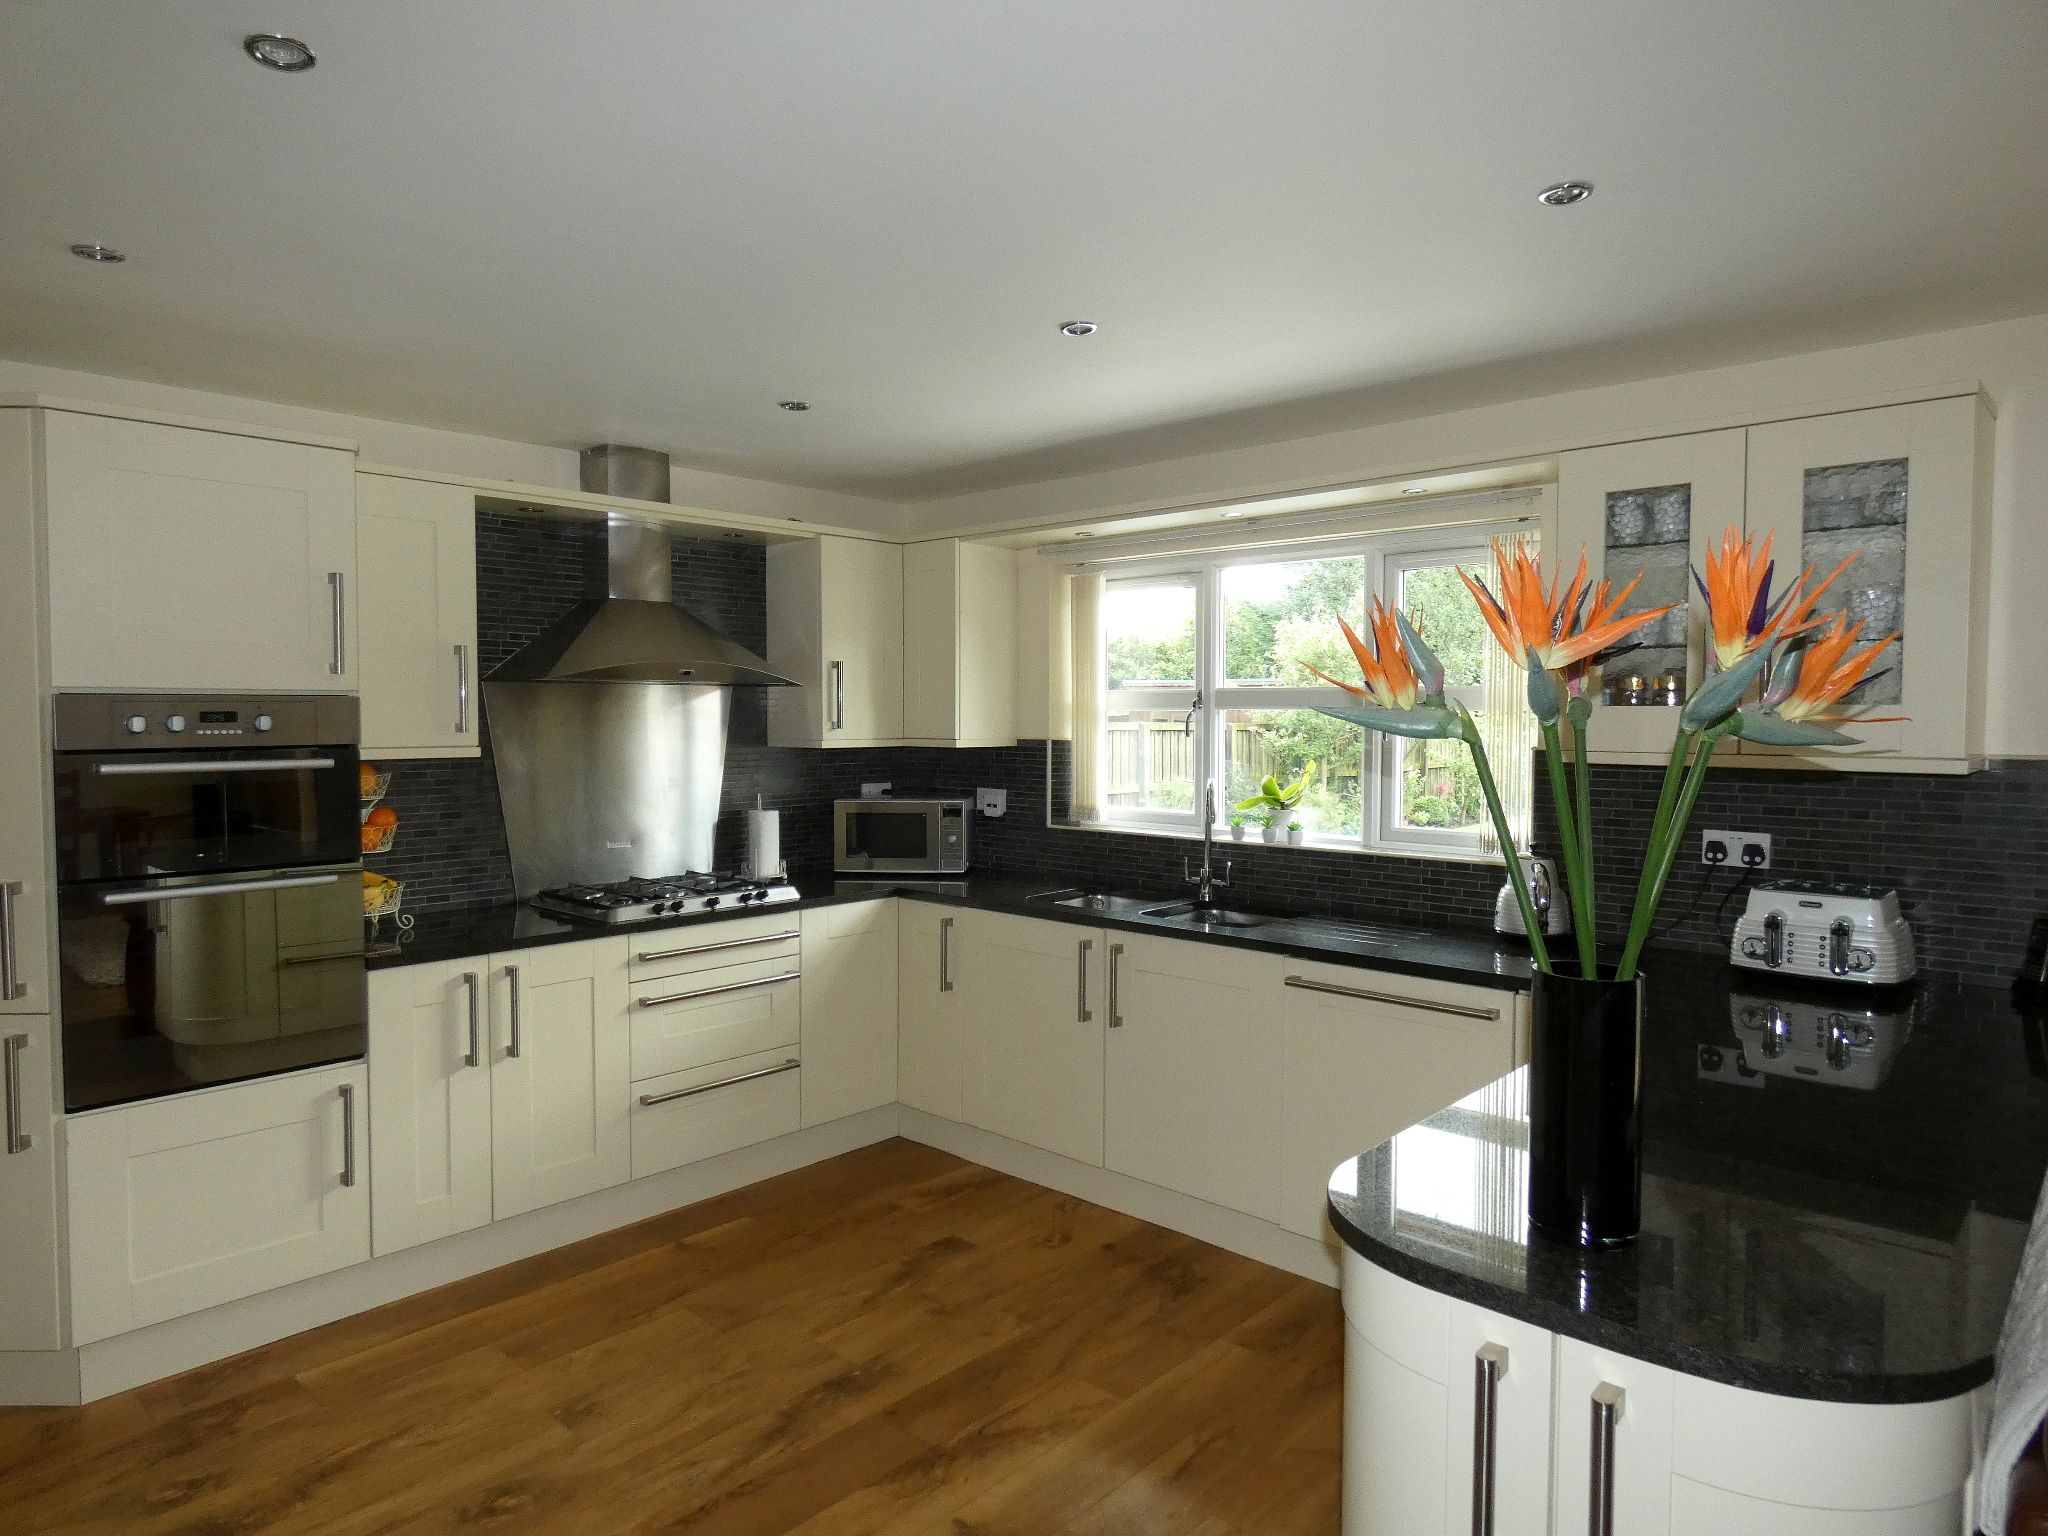 4 bedroom detached house For Sale in Bishop Auckland - Kitchen.